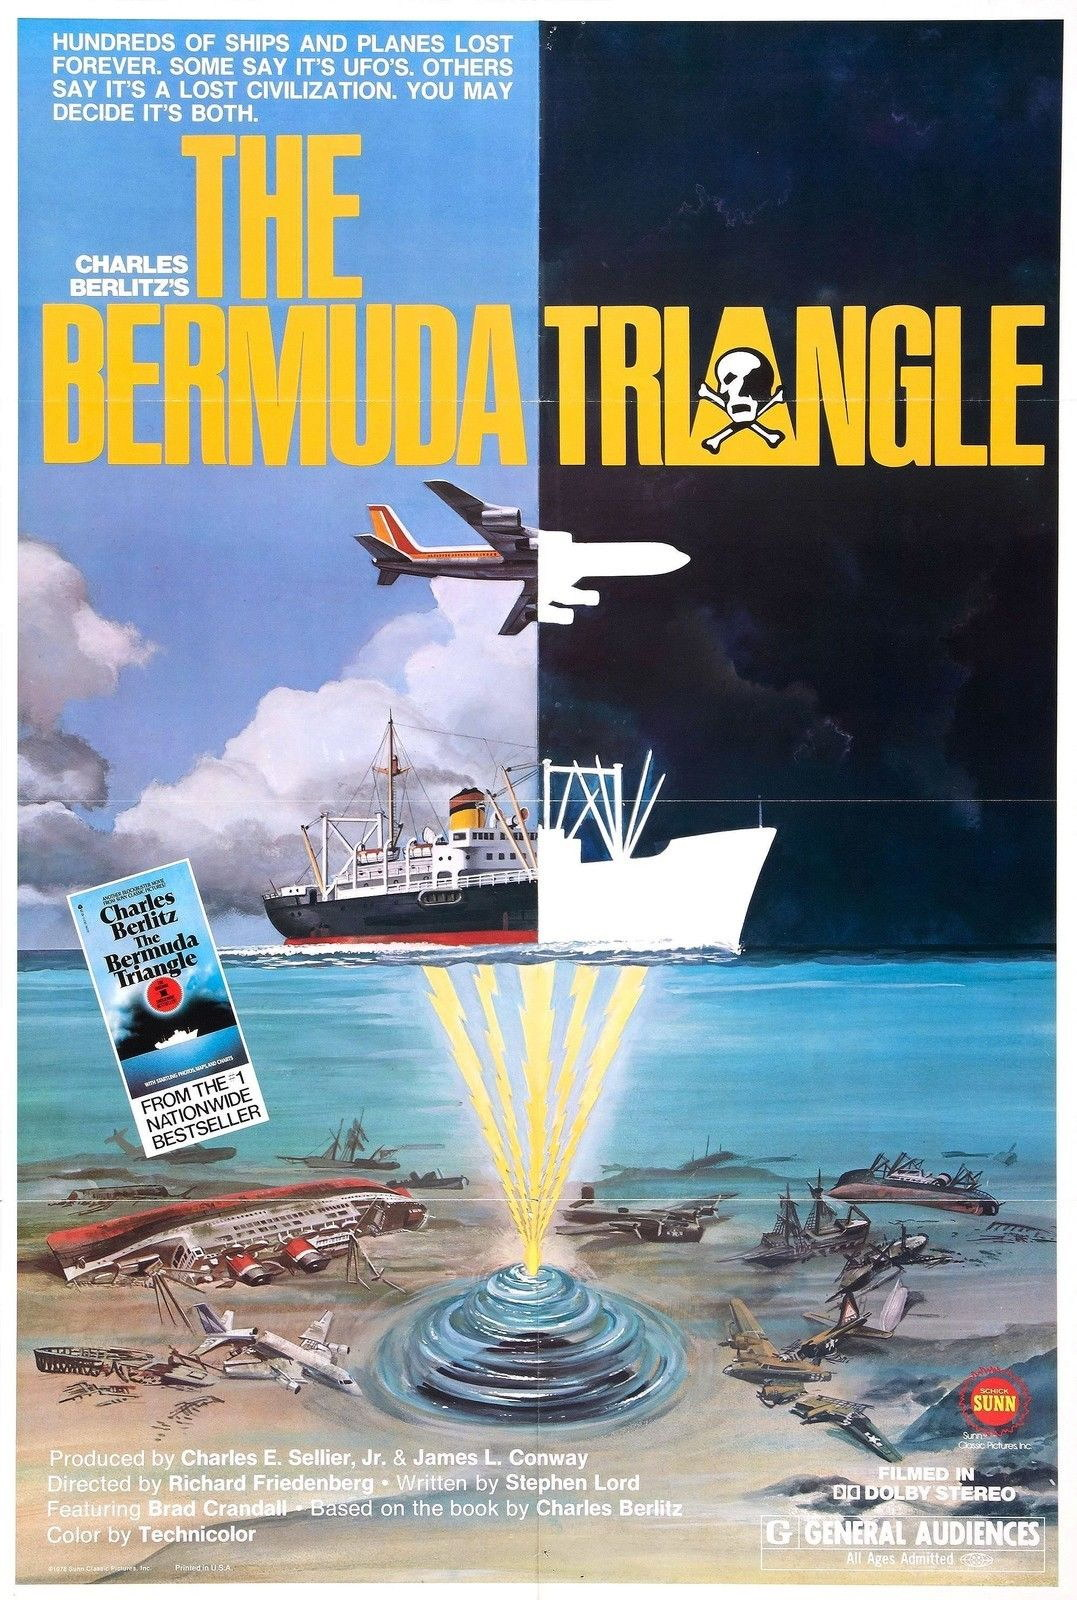 73737-THE-BERMUDA-TRIANGLE-Movie-Thriller-Sci-Fi-Wall-Print-Poster-Affiche